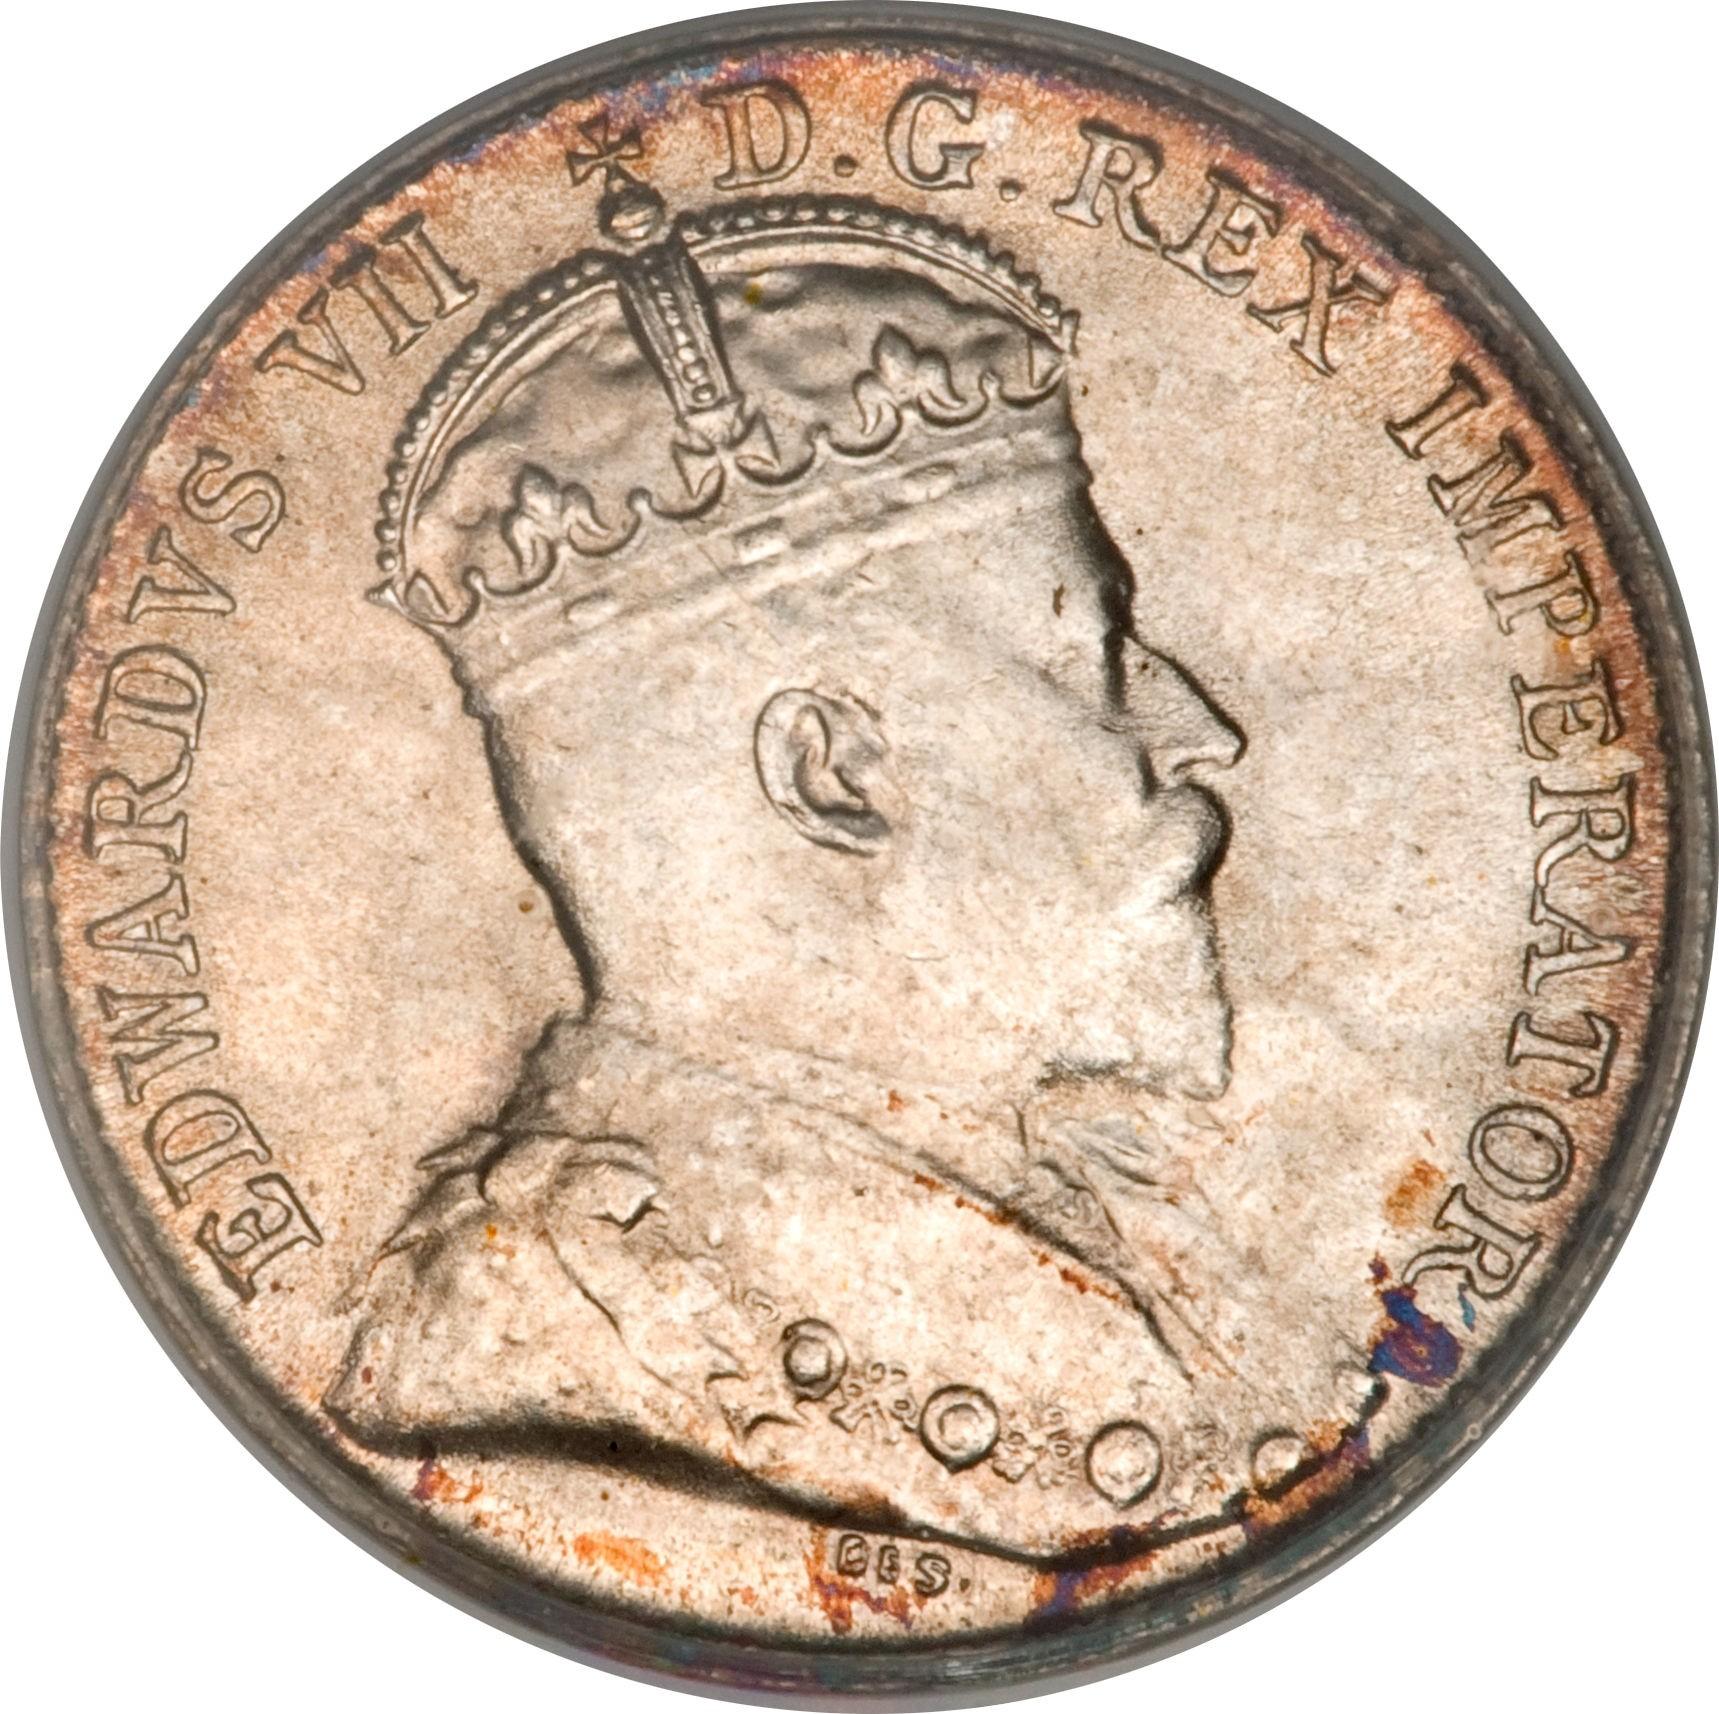 Canada 5 Cents (1902 Edward VII)